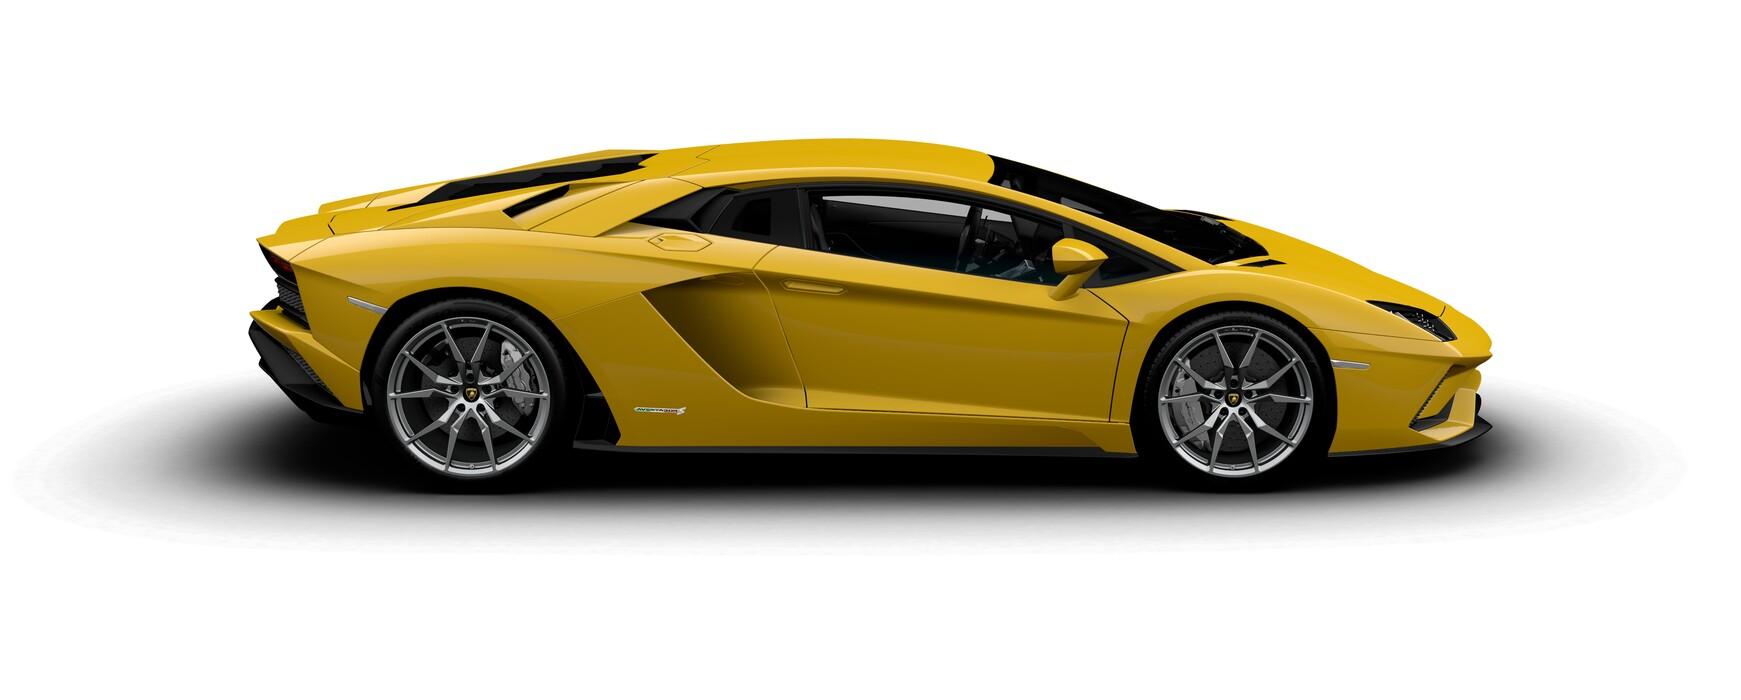 Lamborghini Aventador S Coupe gloss Giallo Evros side view